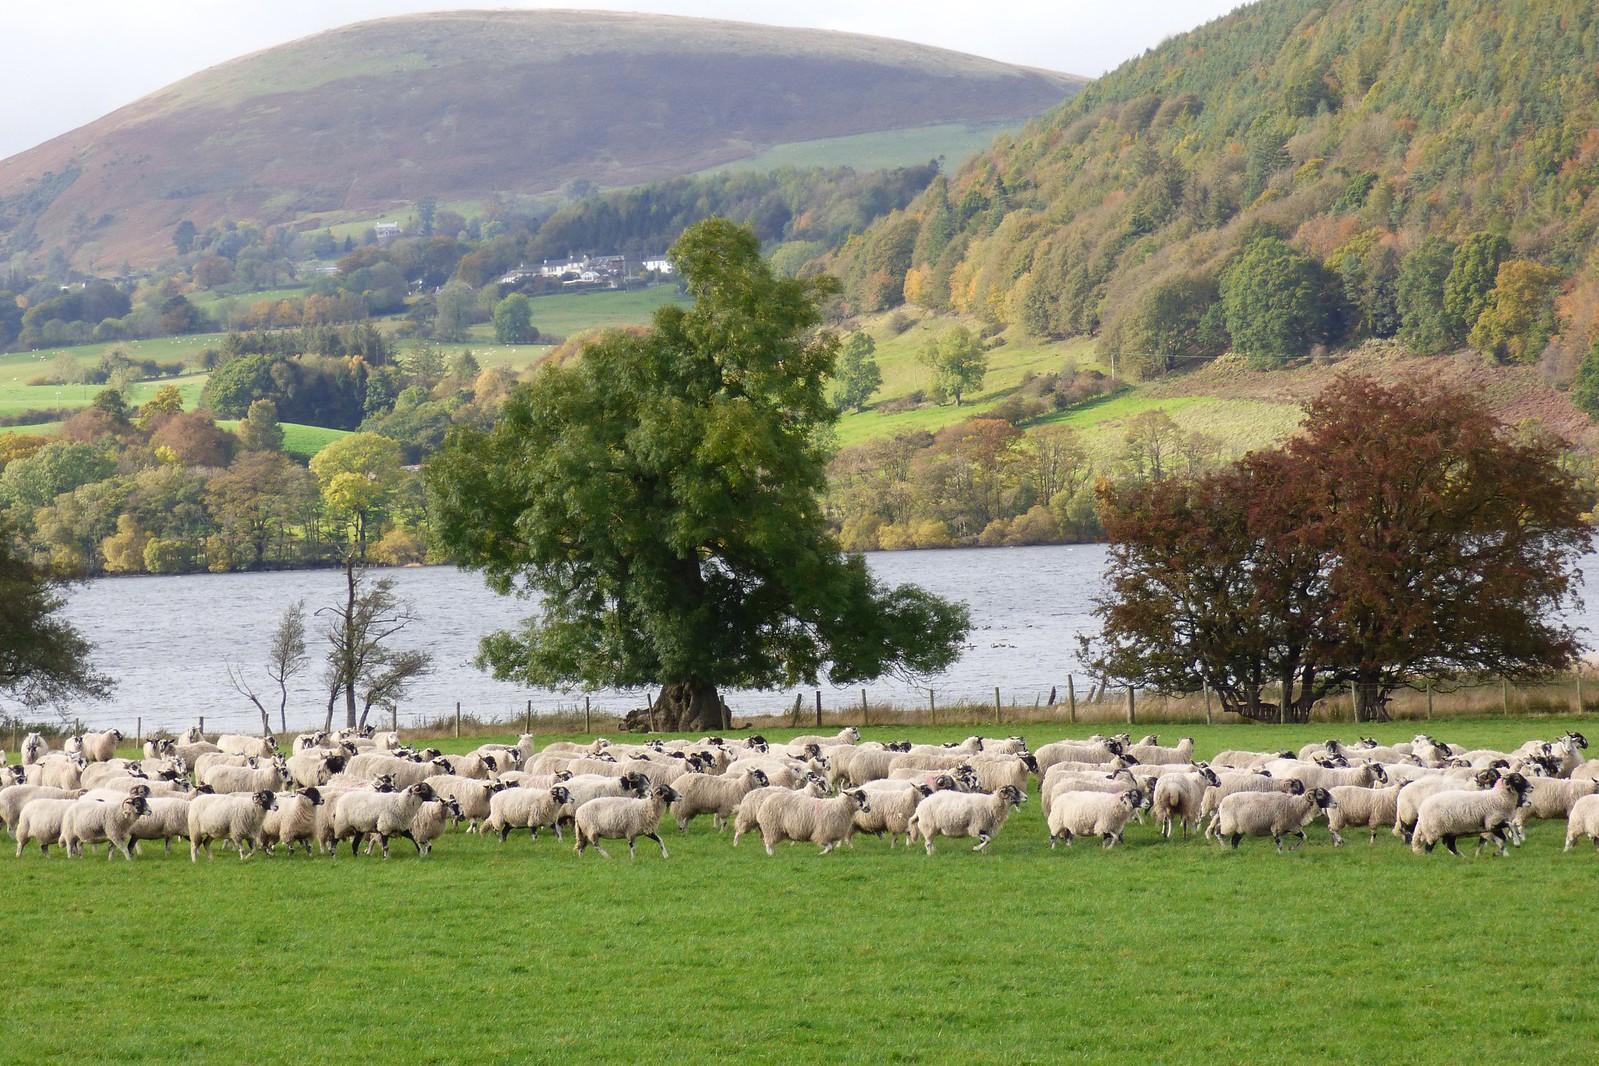 Sheep gathering, Ullswater, Cumbria